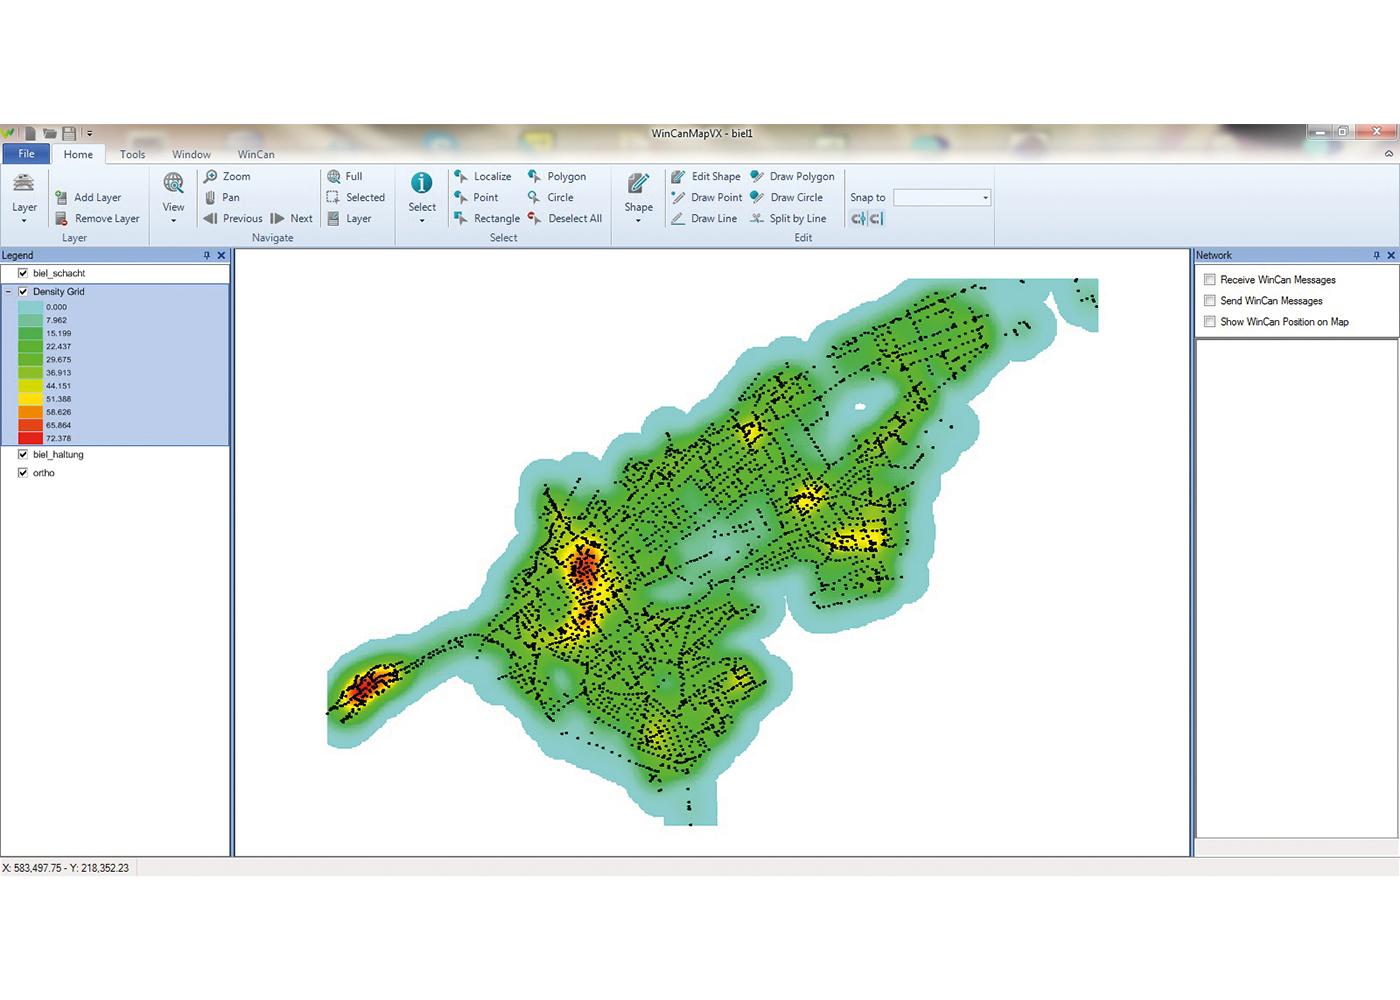 wincan analyst screenshot